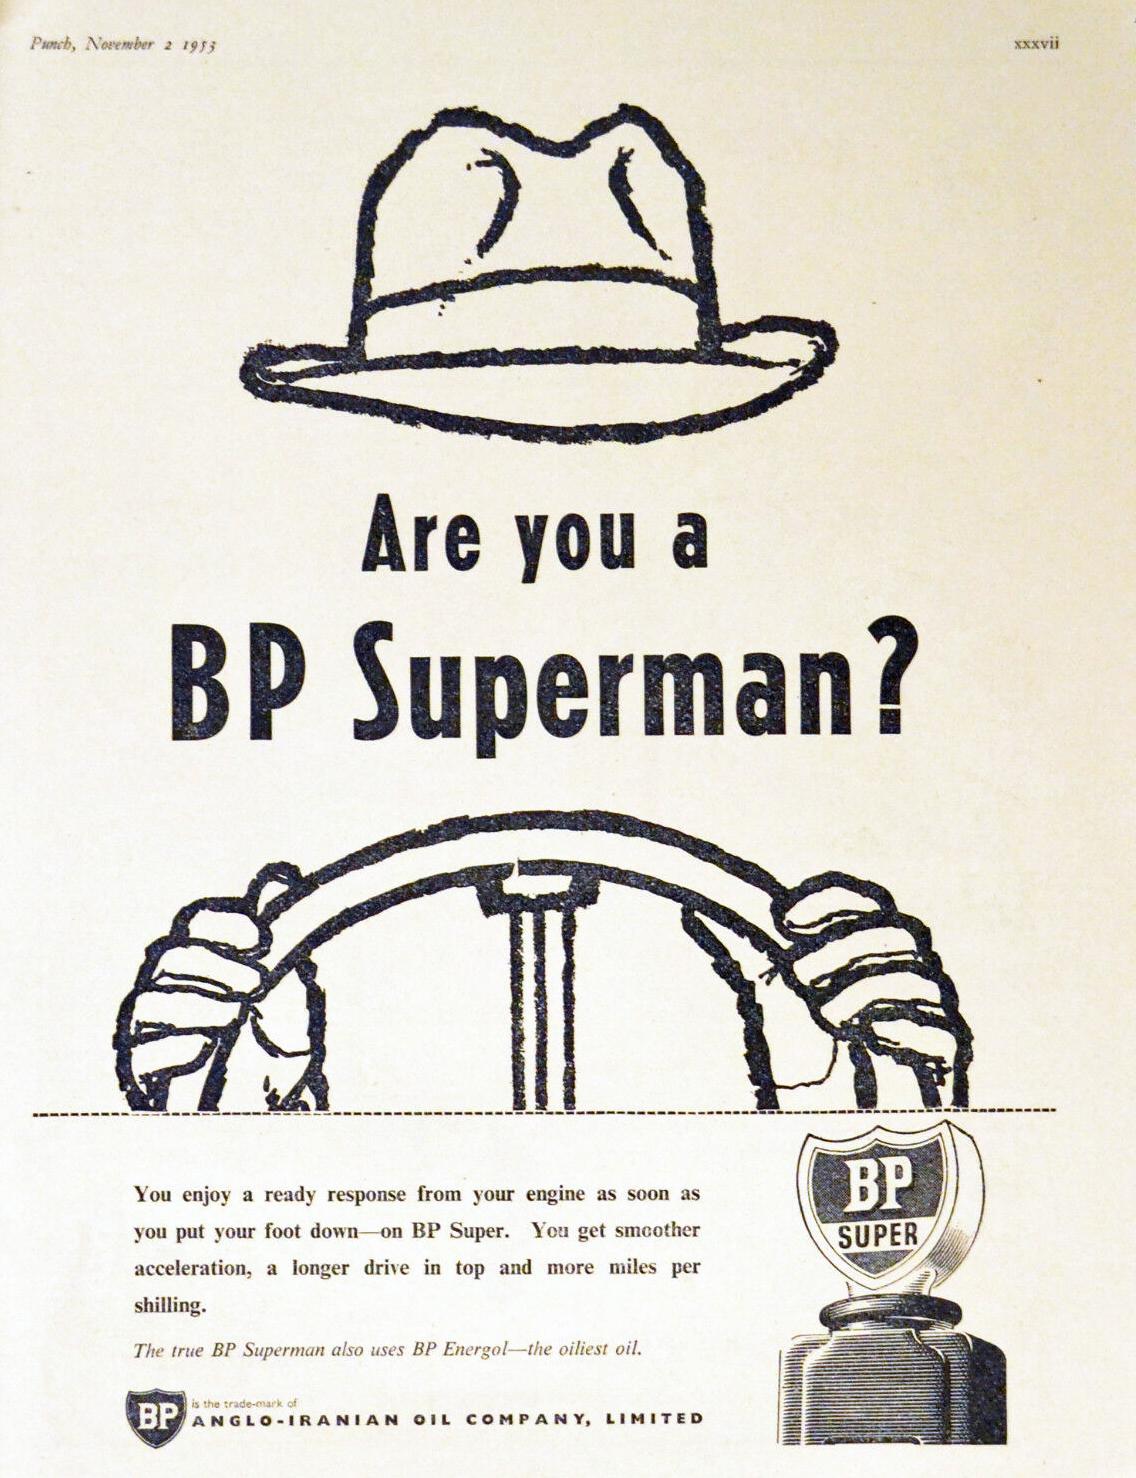 November 1953 advert in Punch, for BP Super fuel